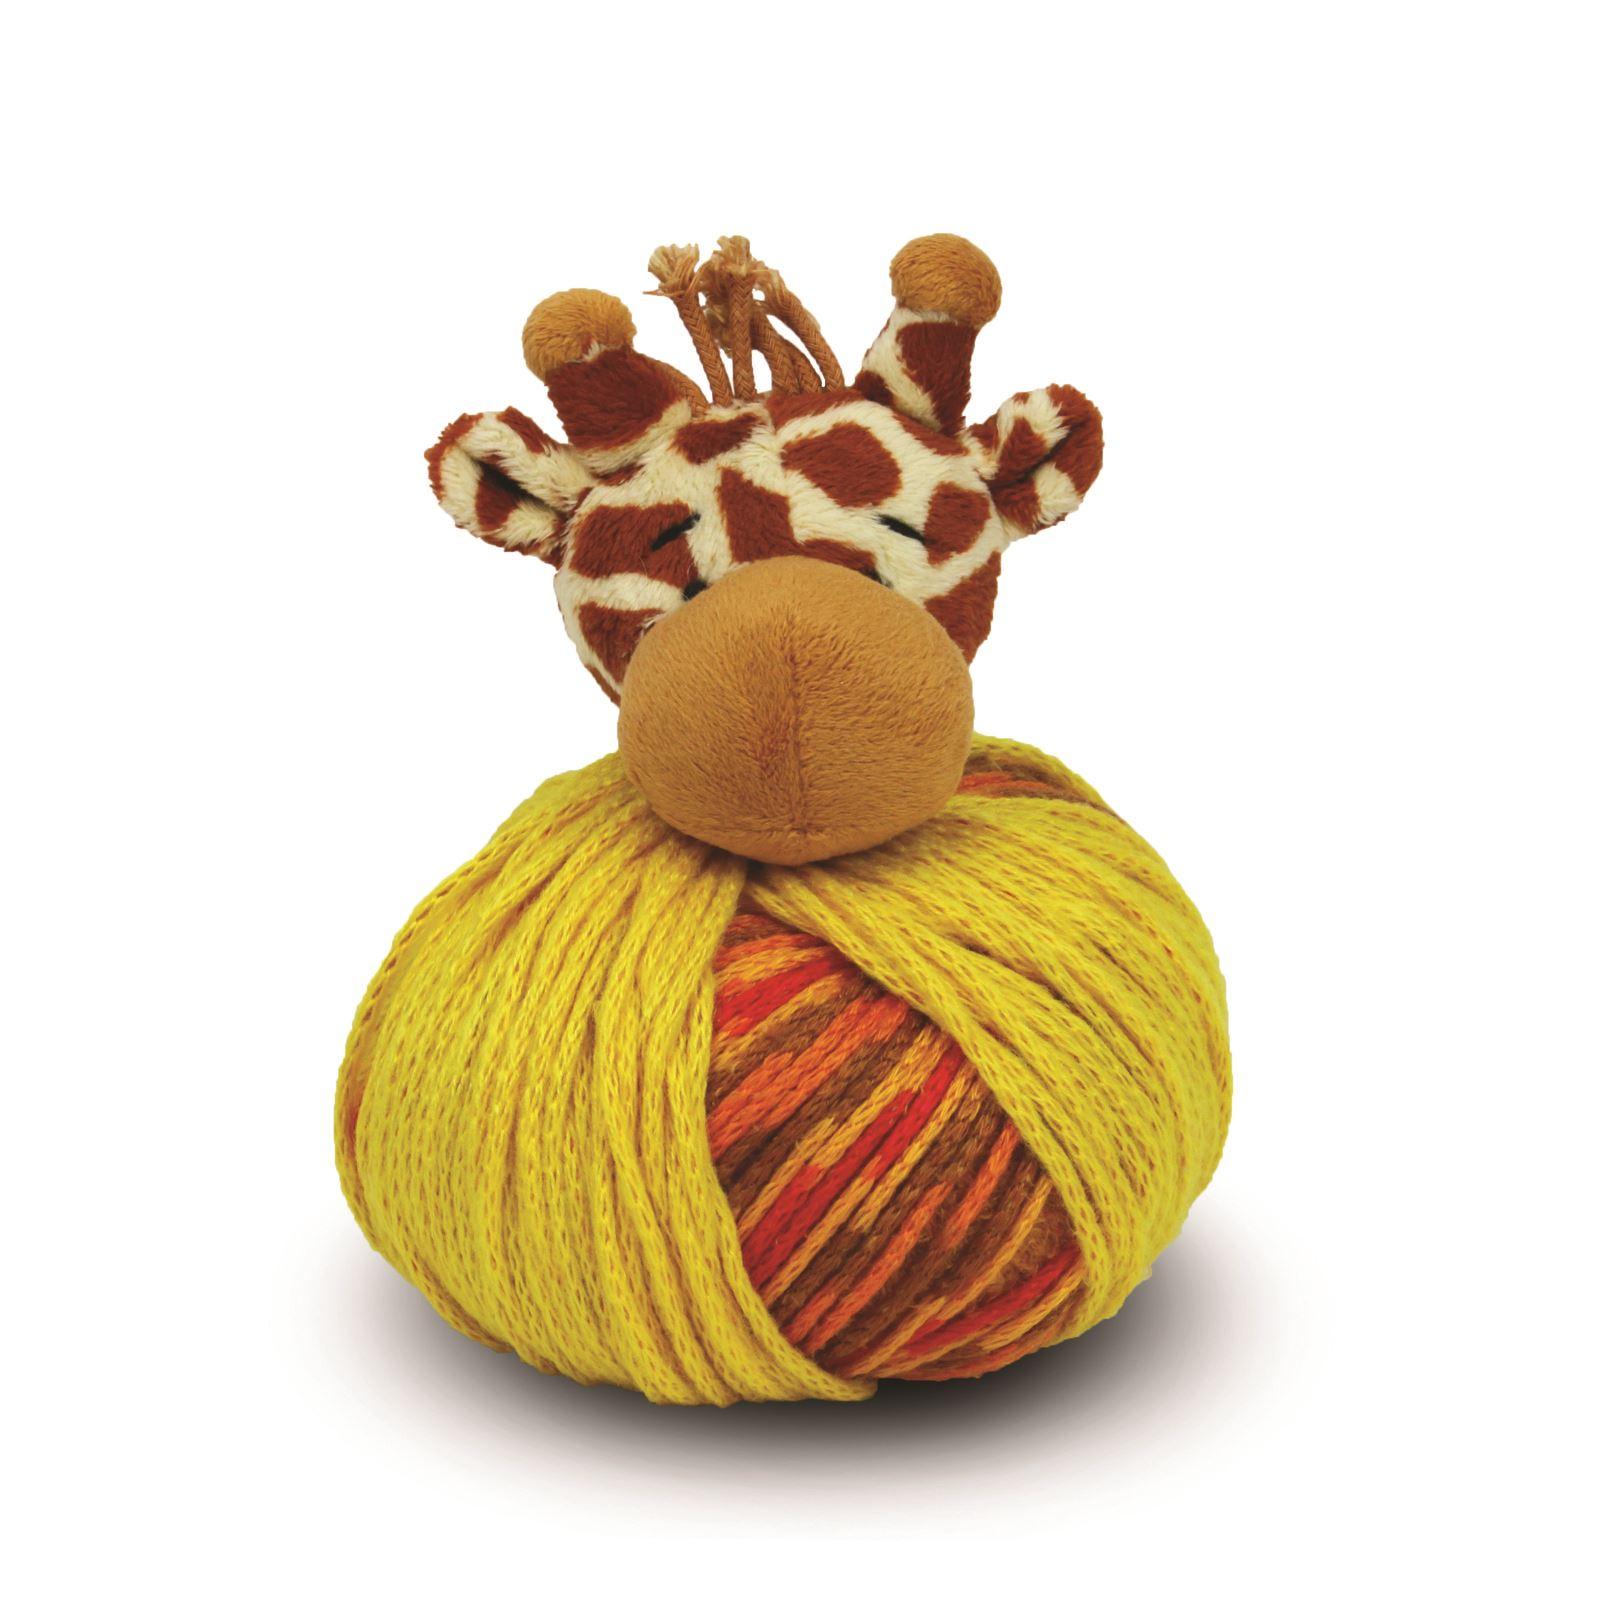 Childrens Knitting Kits Uk : Dmc top this kids hat knitting kits characters christmas wool